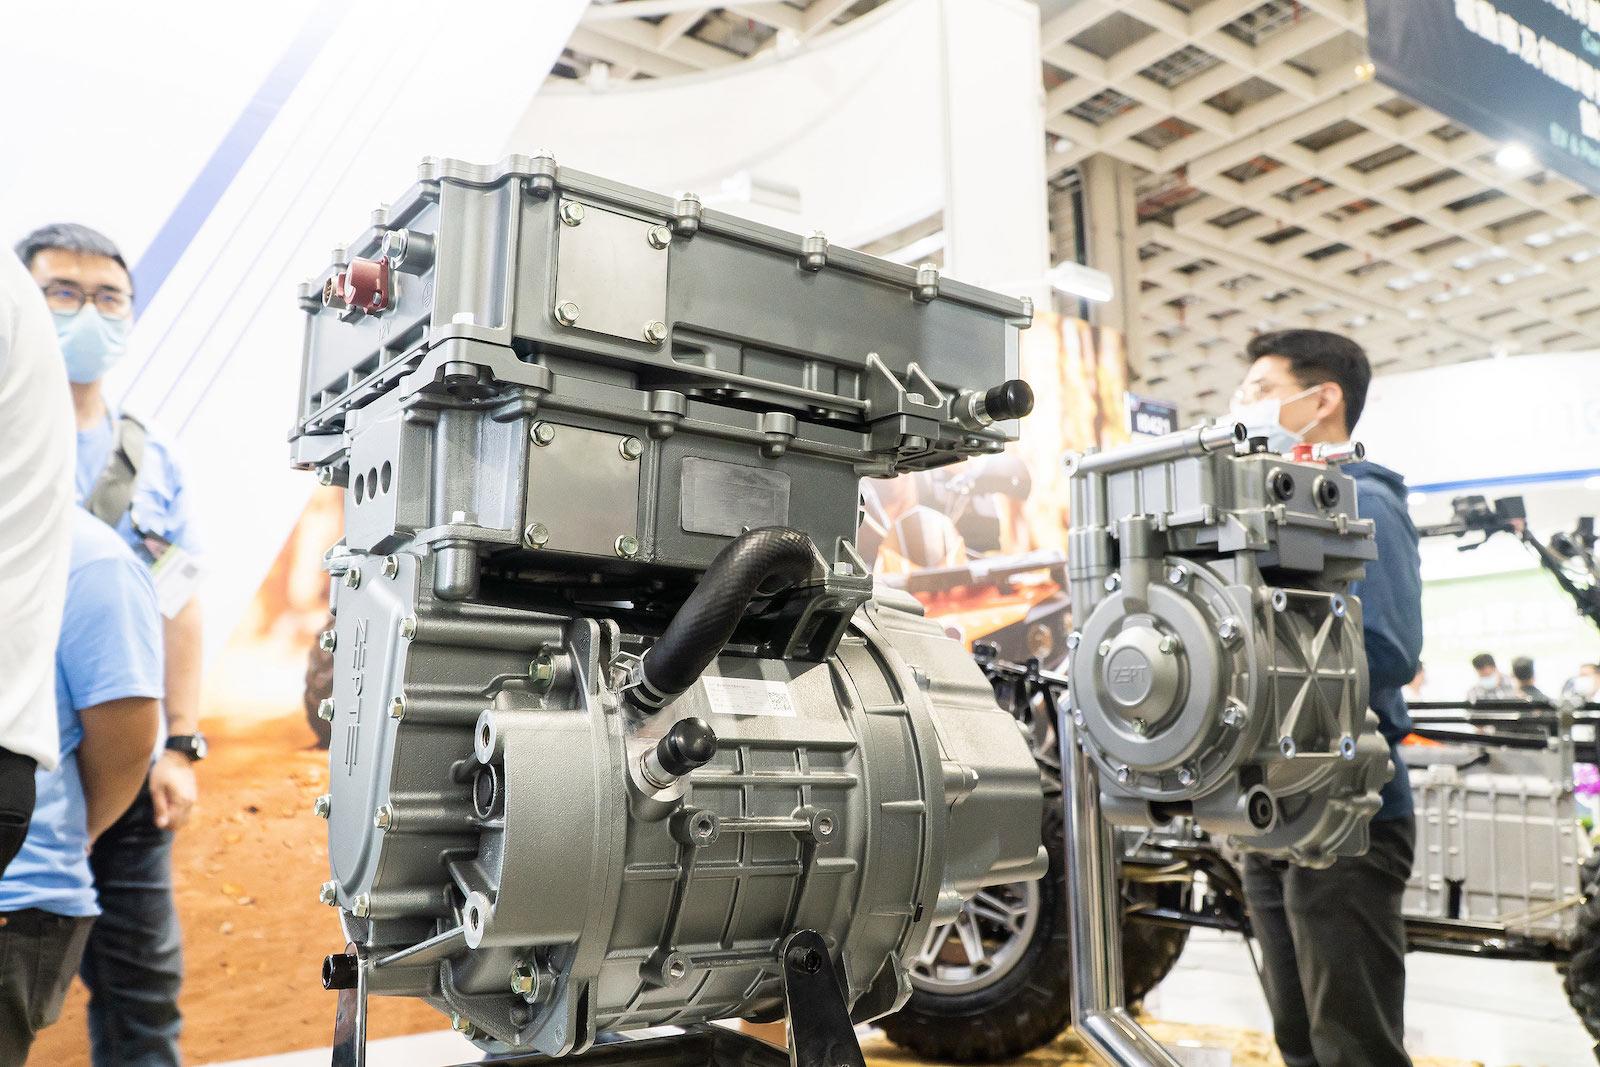 ZEPT捷能動力科技所推出的第一代產品EDM1-P95kW三合一動力系統,適用情境包括共享通勤、物流載運…等等。